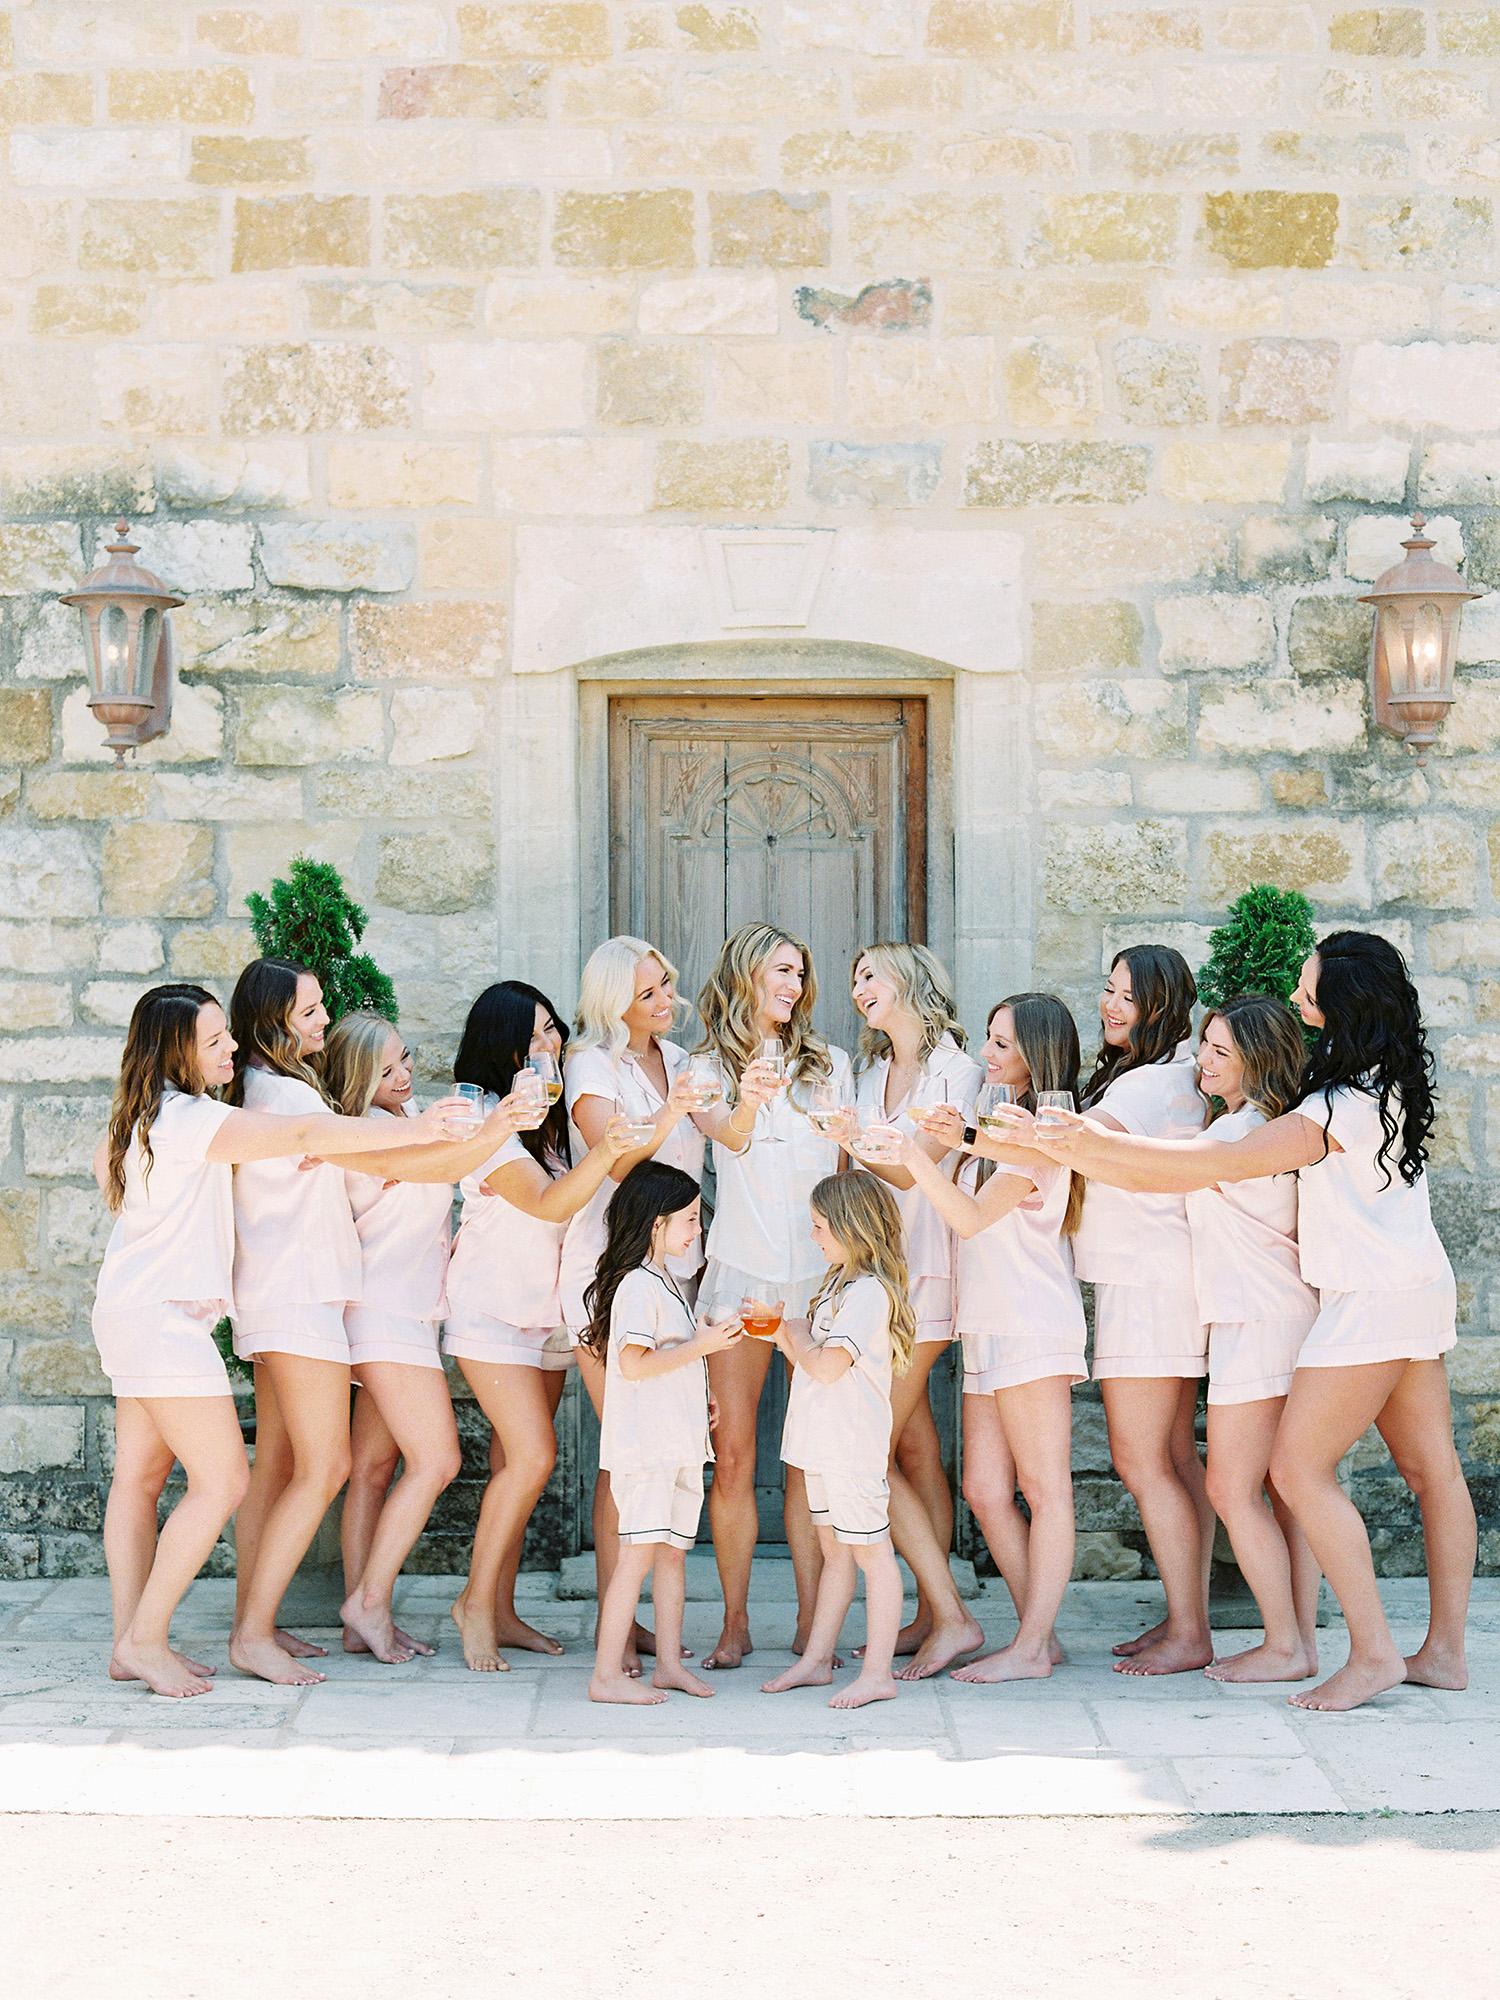 kati erik wedding bride bridesmaids flower girls getting ready toast